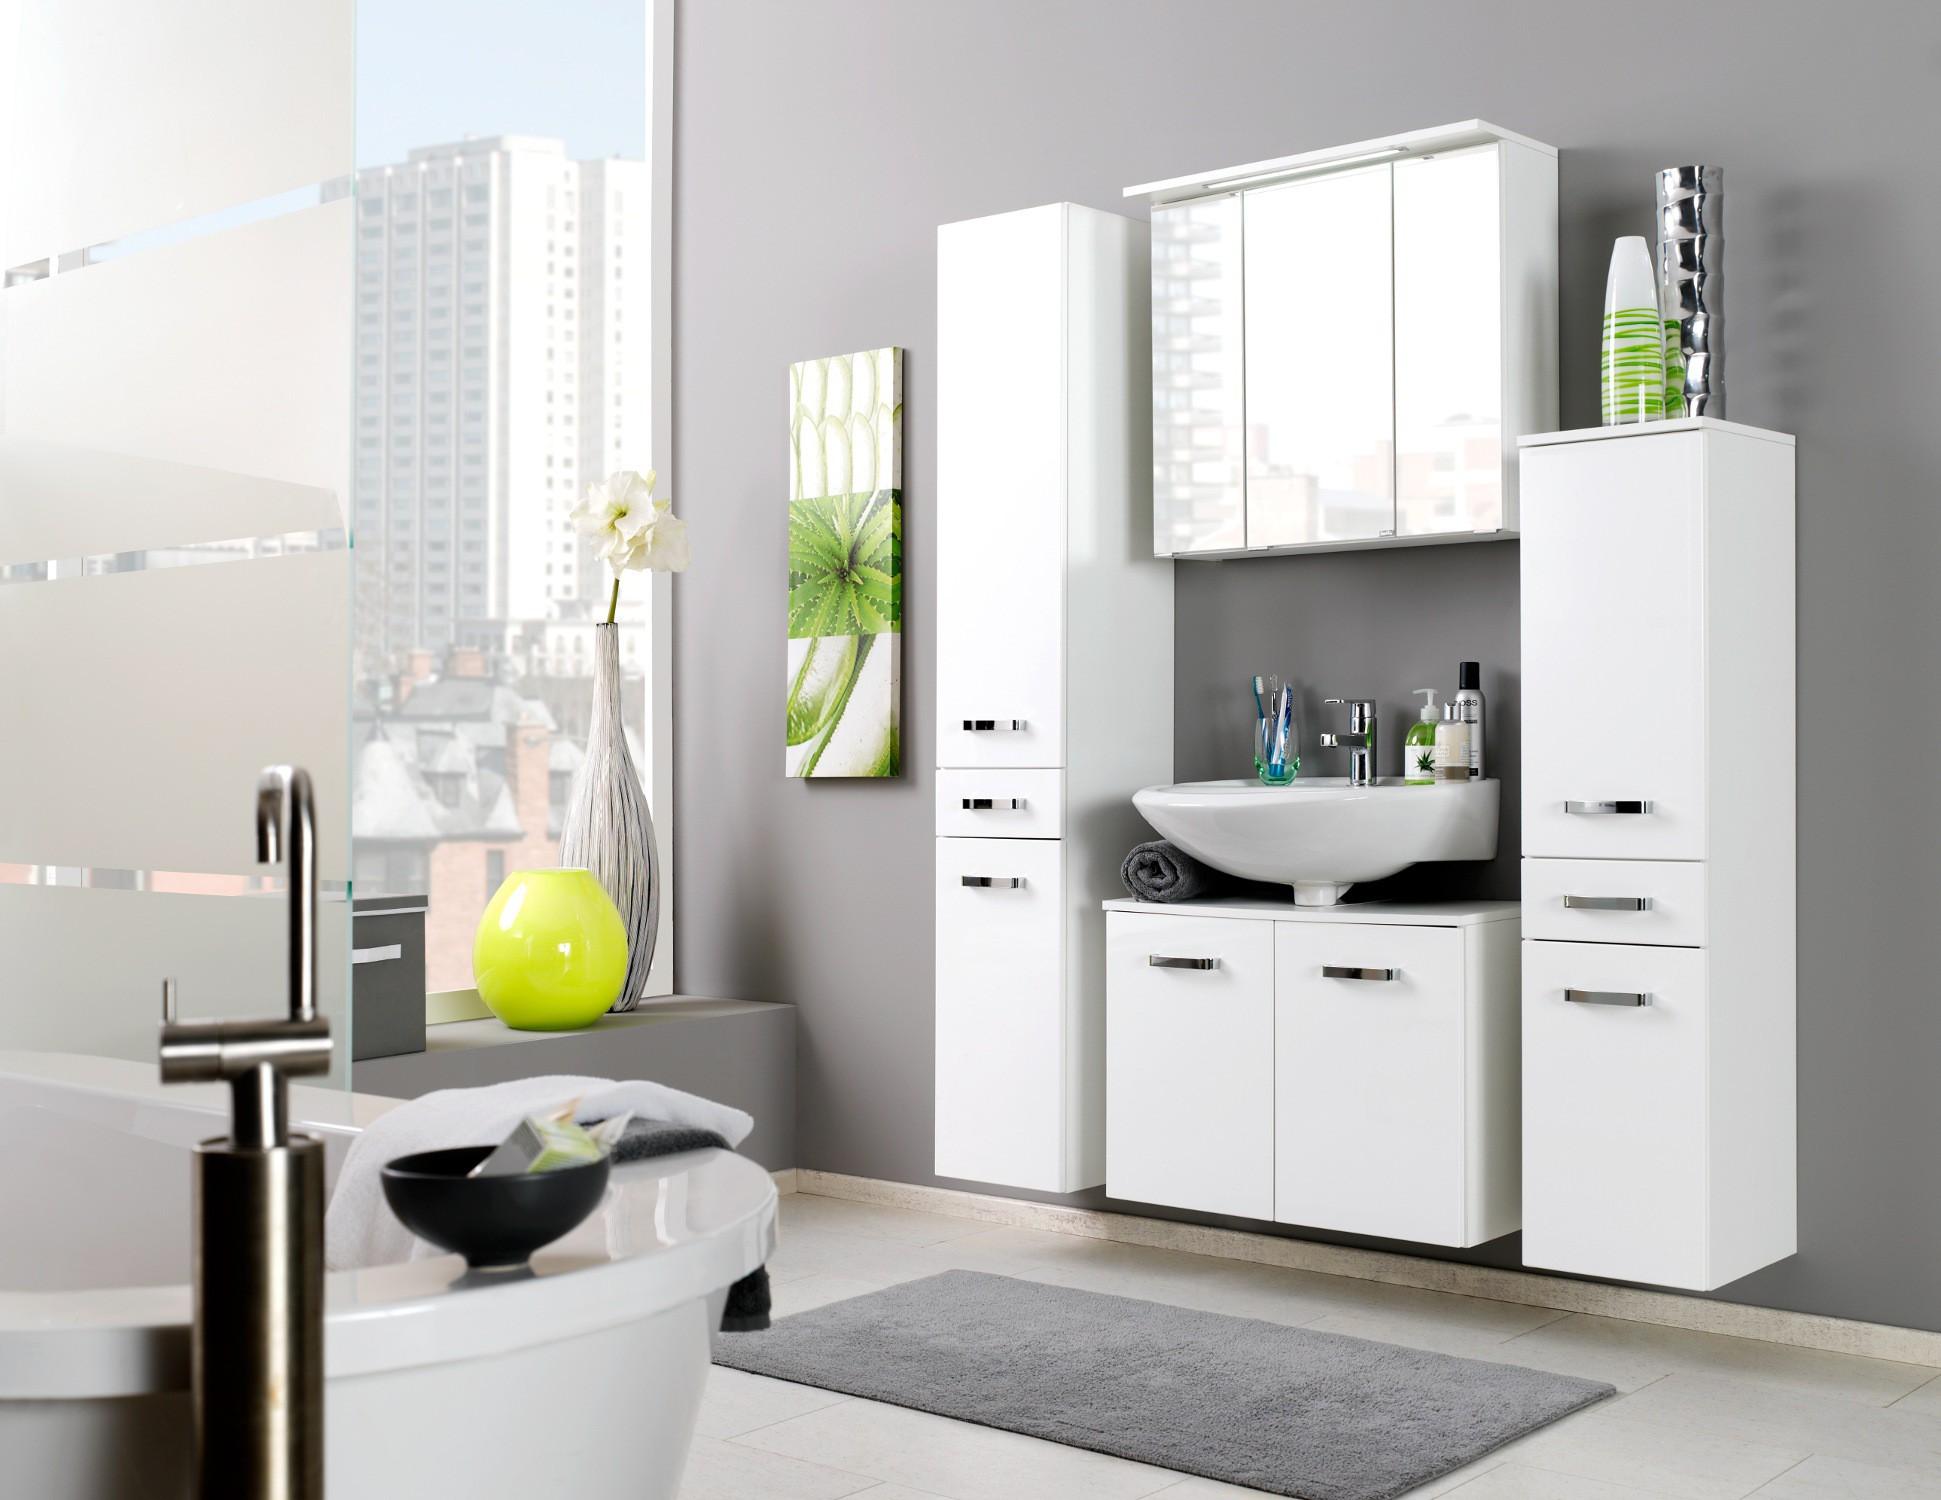 bad hochschrank bologna 2 t rig 1 schublade 30 cm breit hochglanz wei wei bad bologna. Black Bedroom Furniture Sets. Home Design Ideas